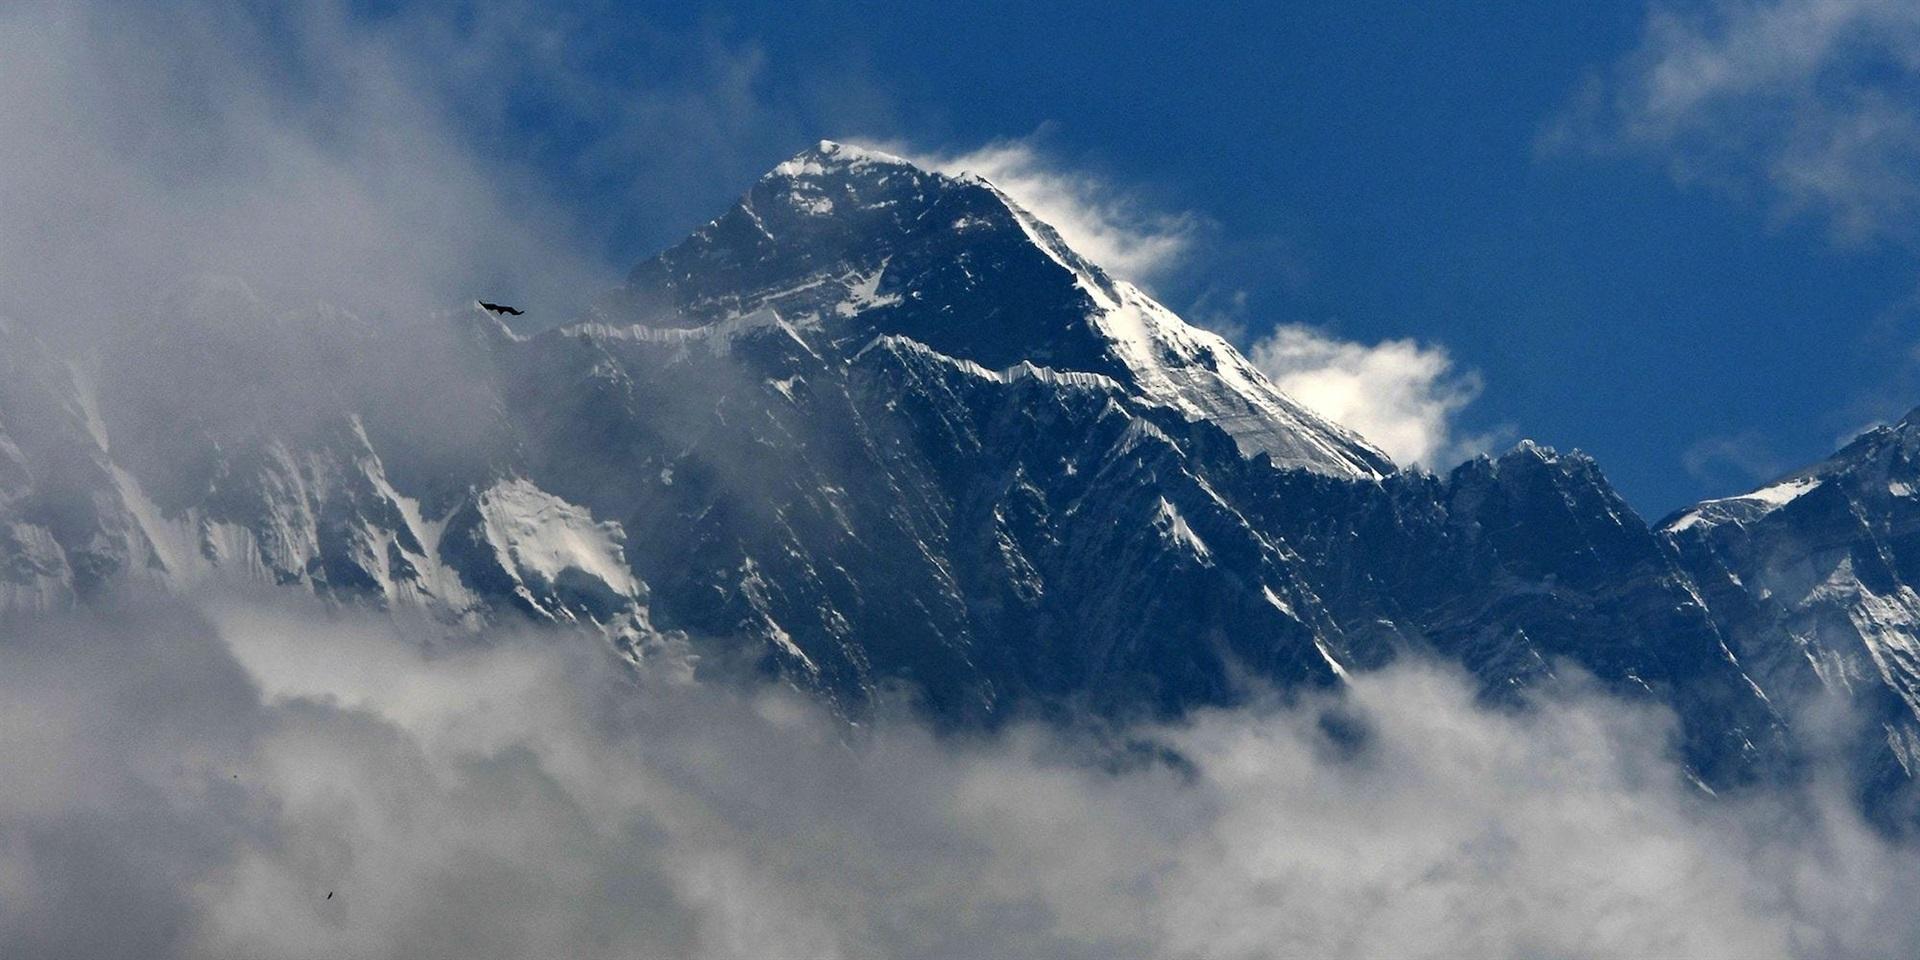 The summit of Mount Everest.